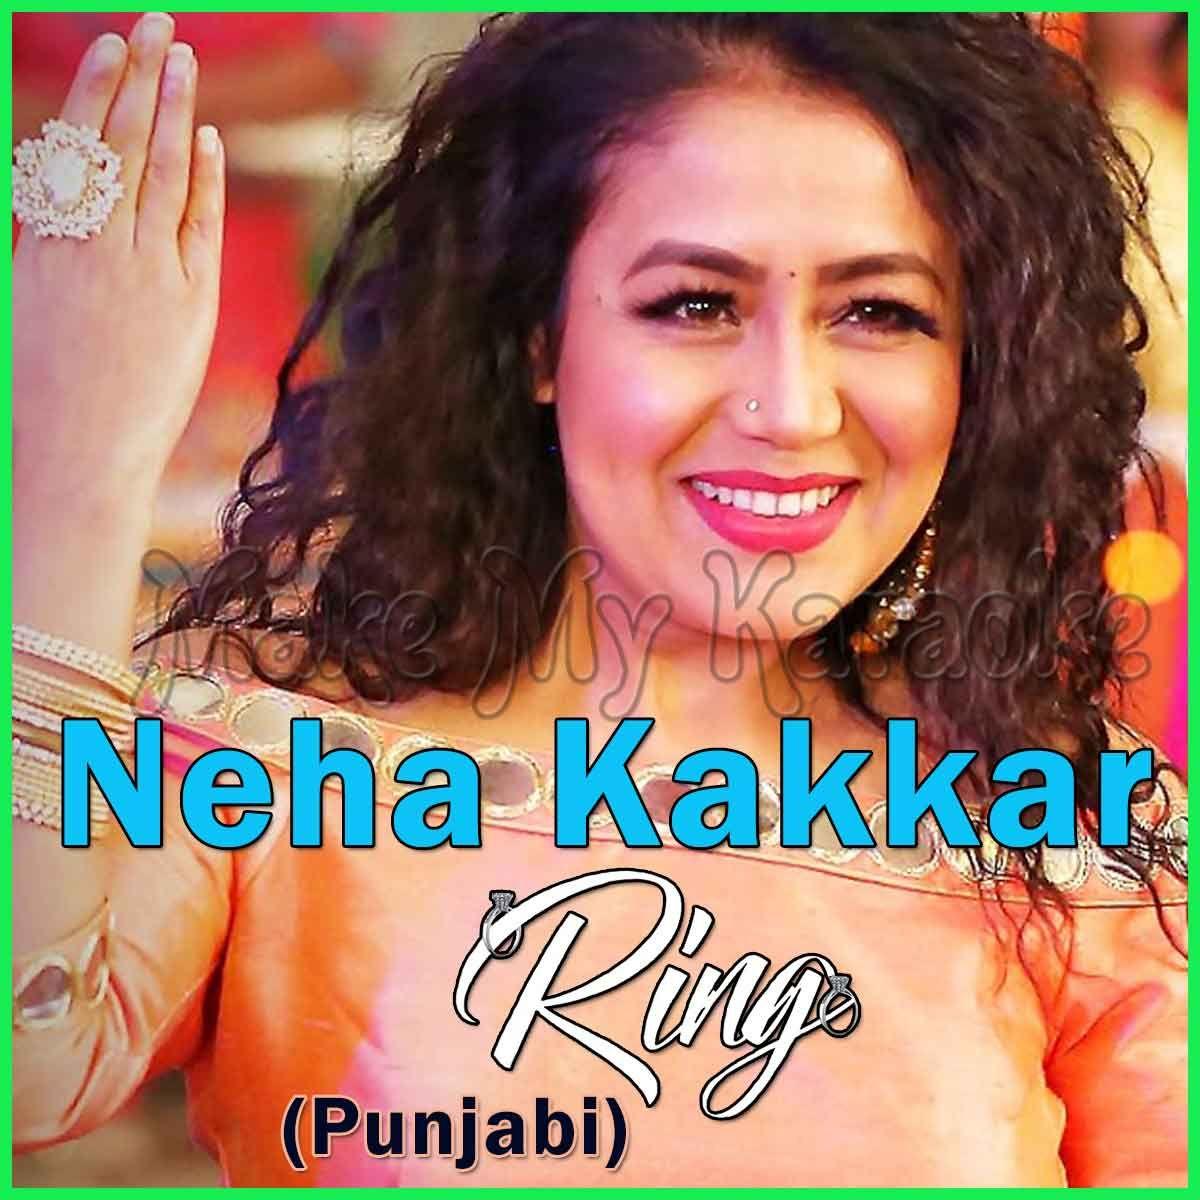 Ring Video Karaoke With Lyrics Neha Kakkar Video Karaoke Karaoke Karaoke Songs Singer